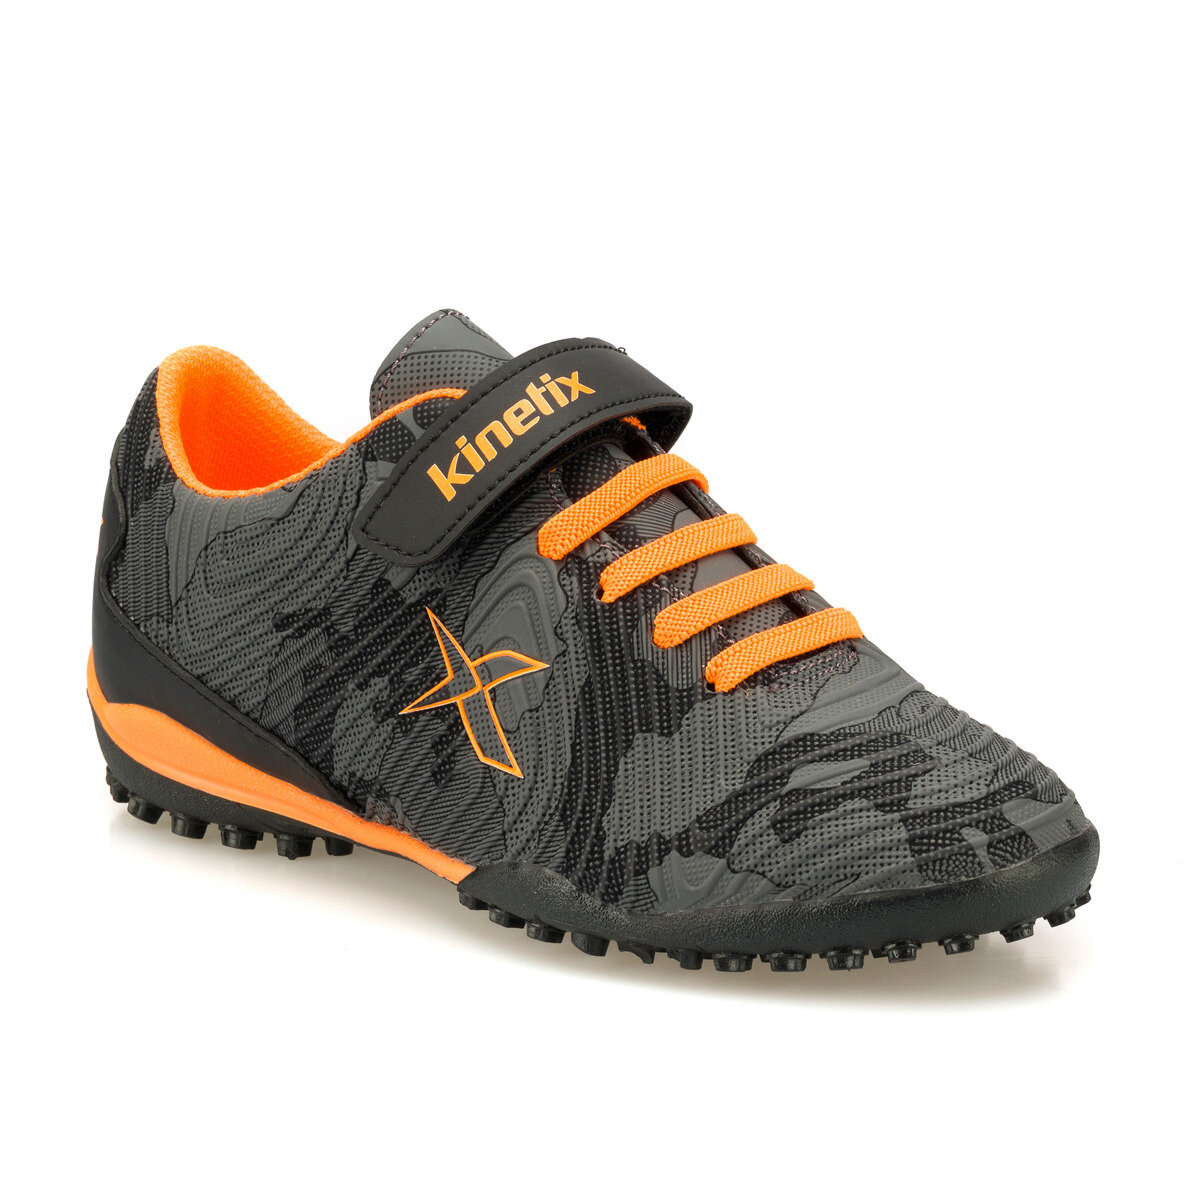 FLO AGRON J CAMO TURF Black Male Child Carpet Field Shoes KINETIX